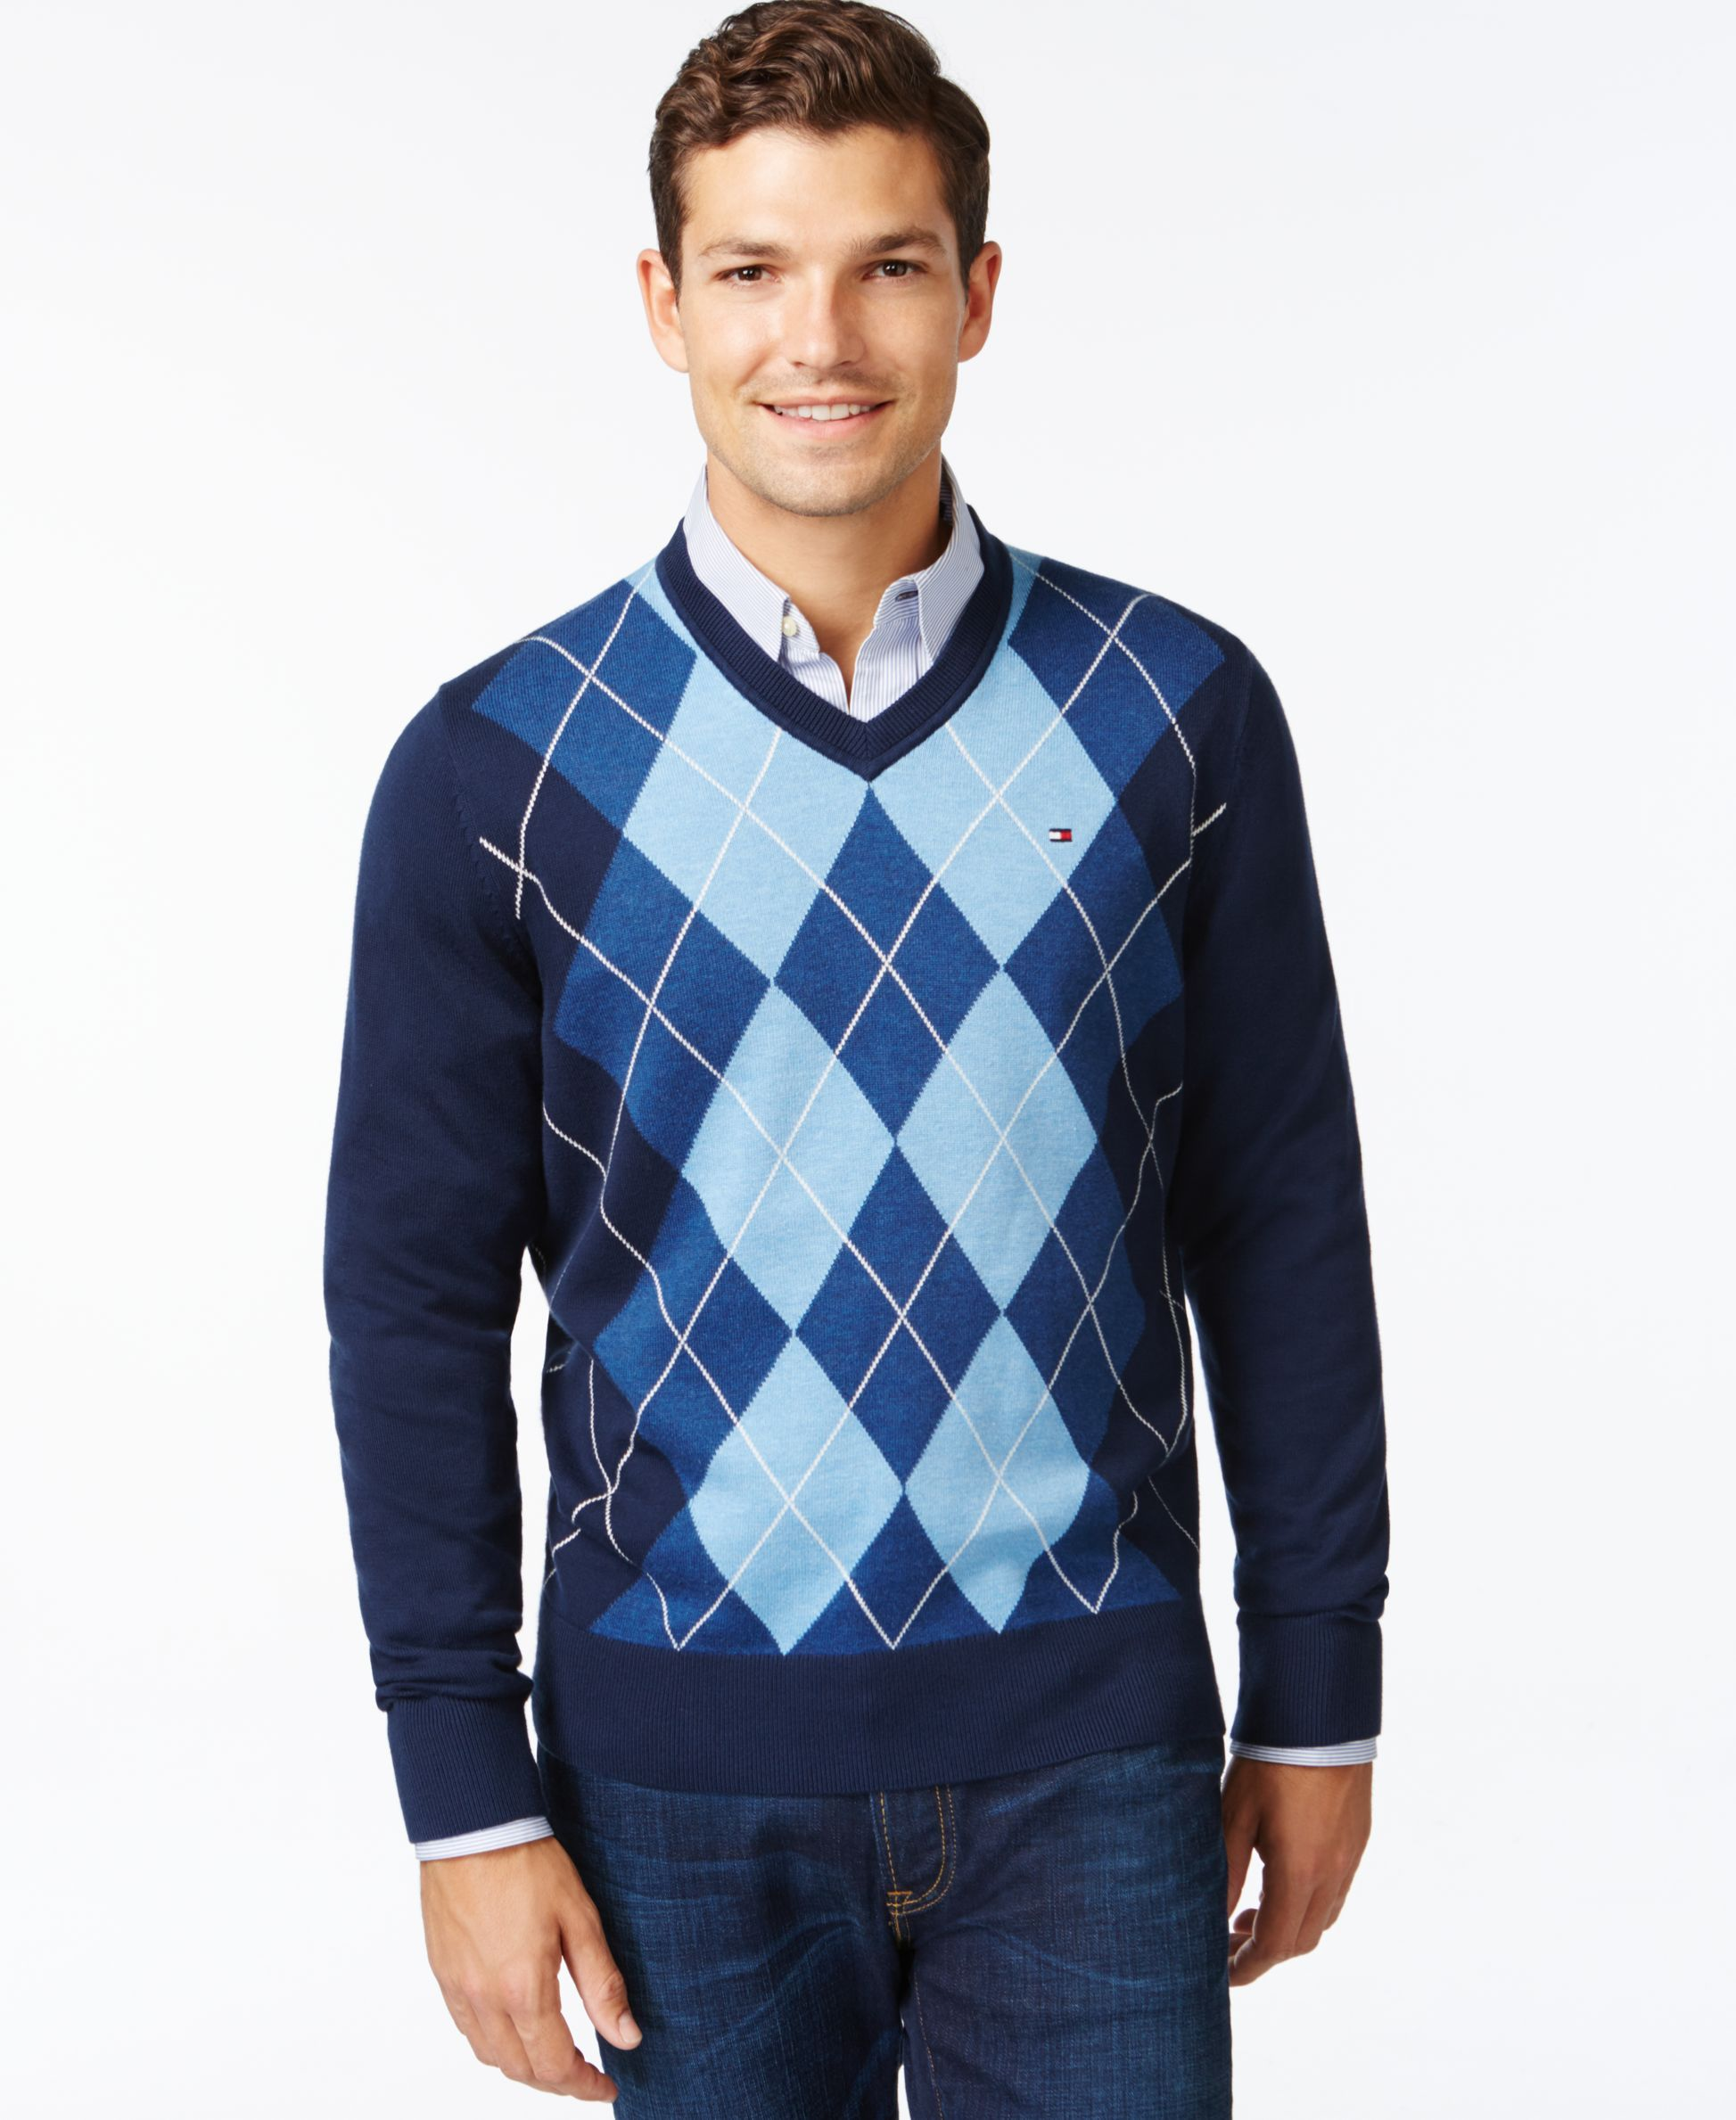 Tommy Hilfiger Signature Argyle V-Neck Sweater